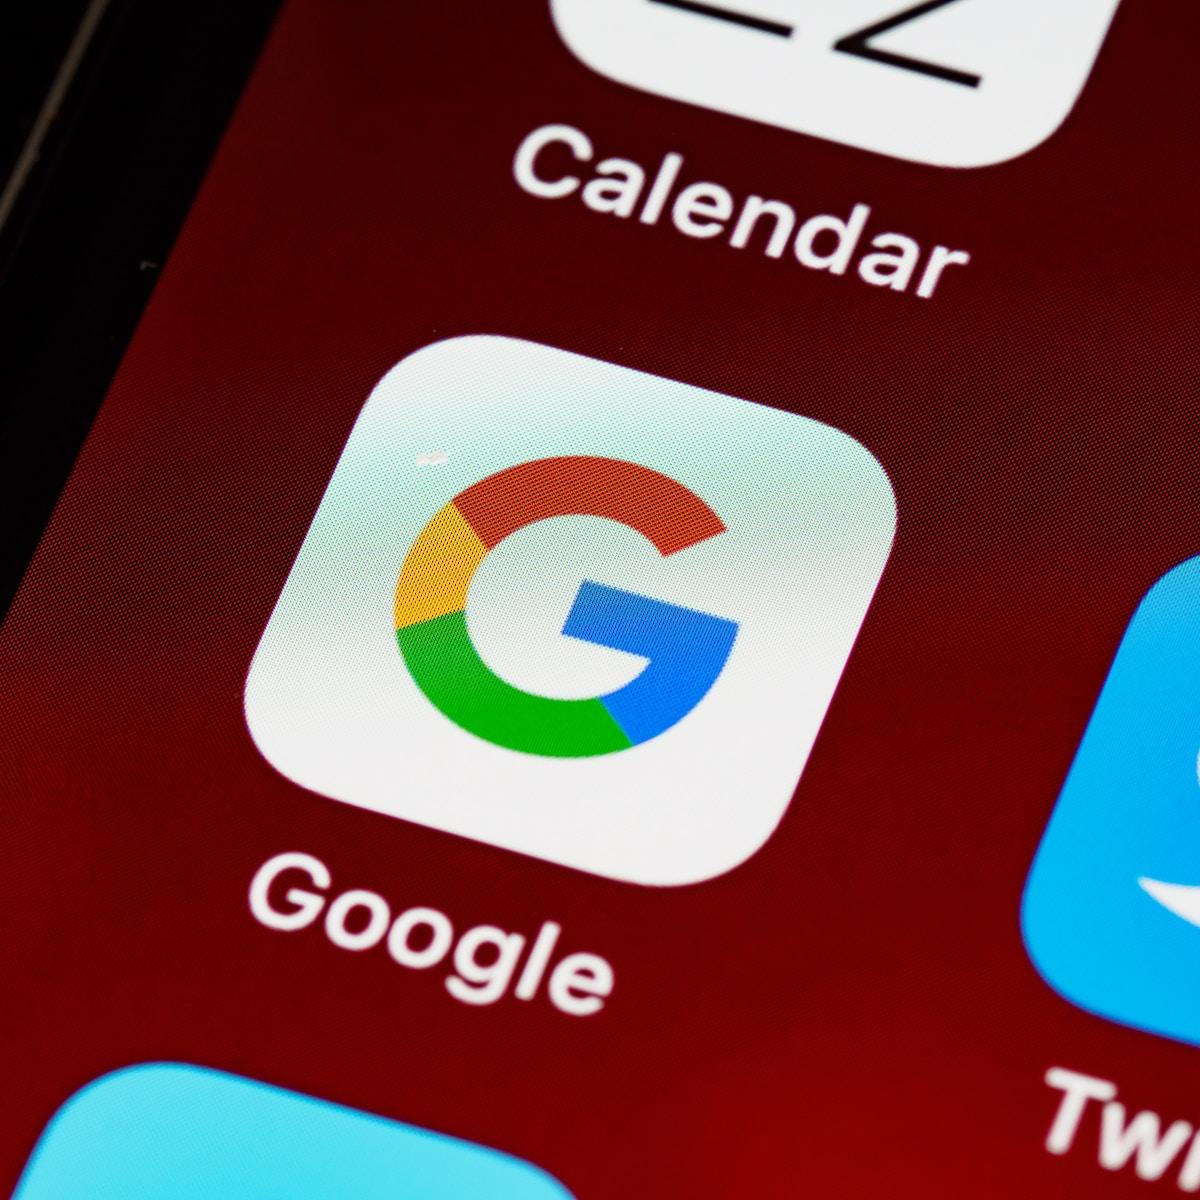 Borrar el historial de Google en el iPhone